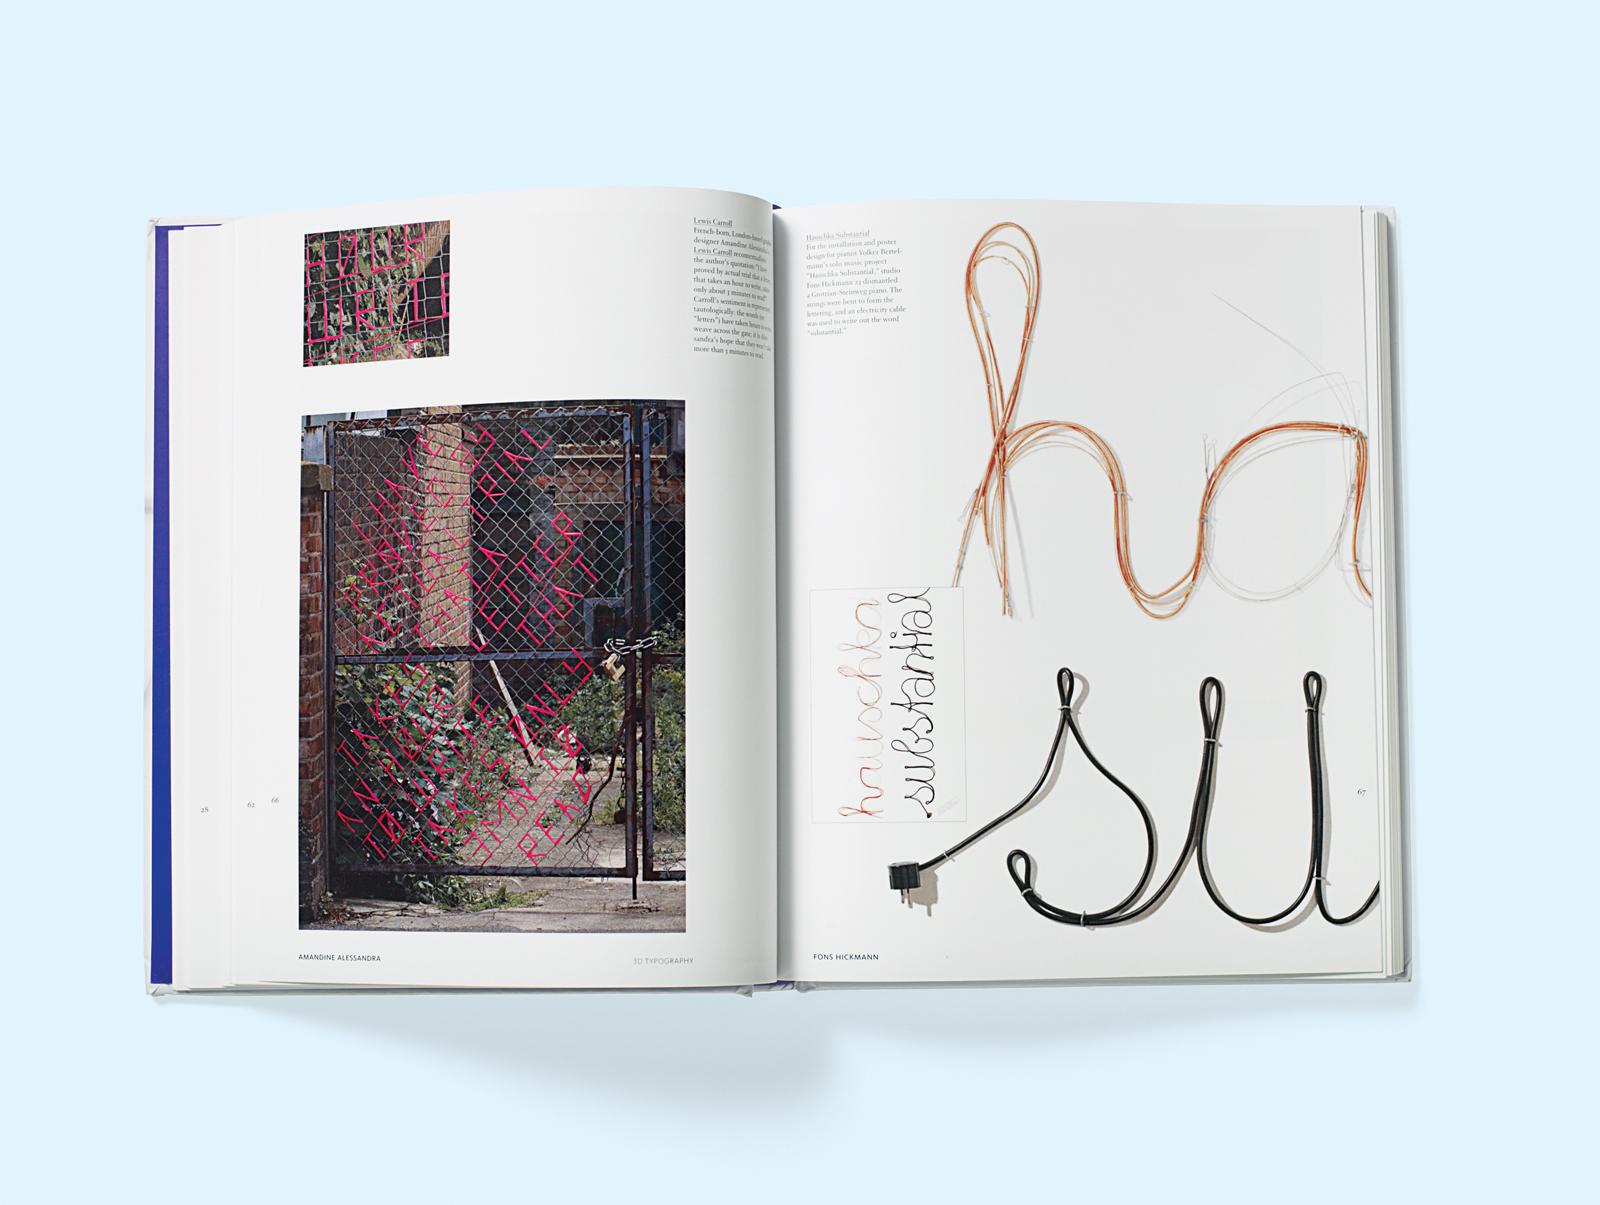 3d typography image spread